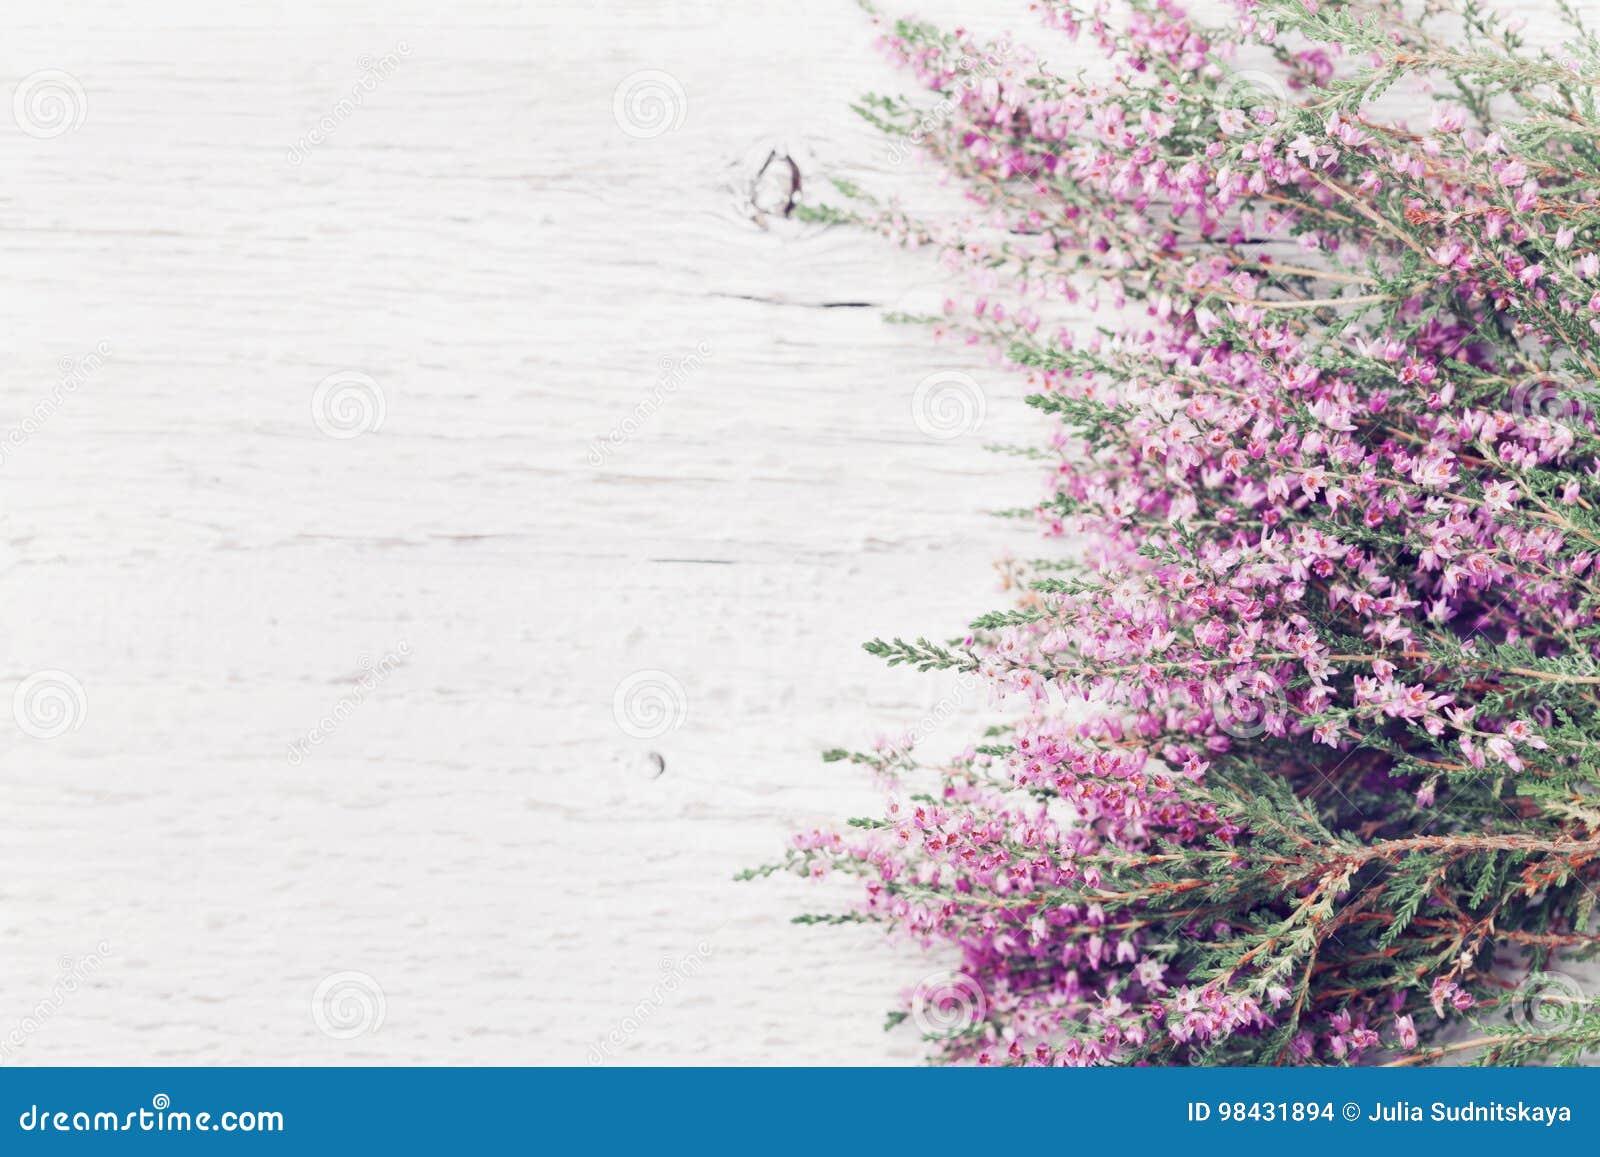 Pink Heather Flower Border Calluna Vulgaris Erica Ling On White